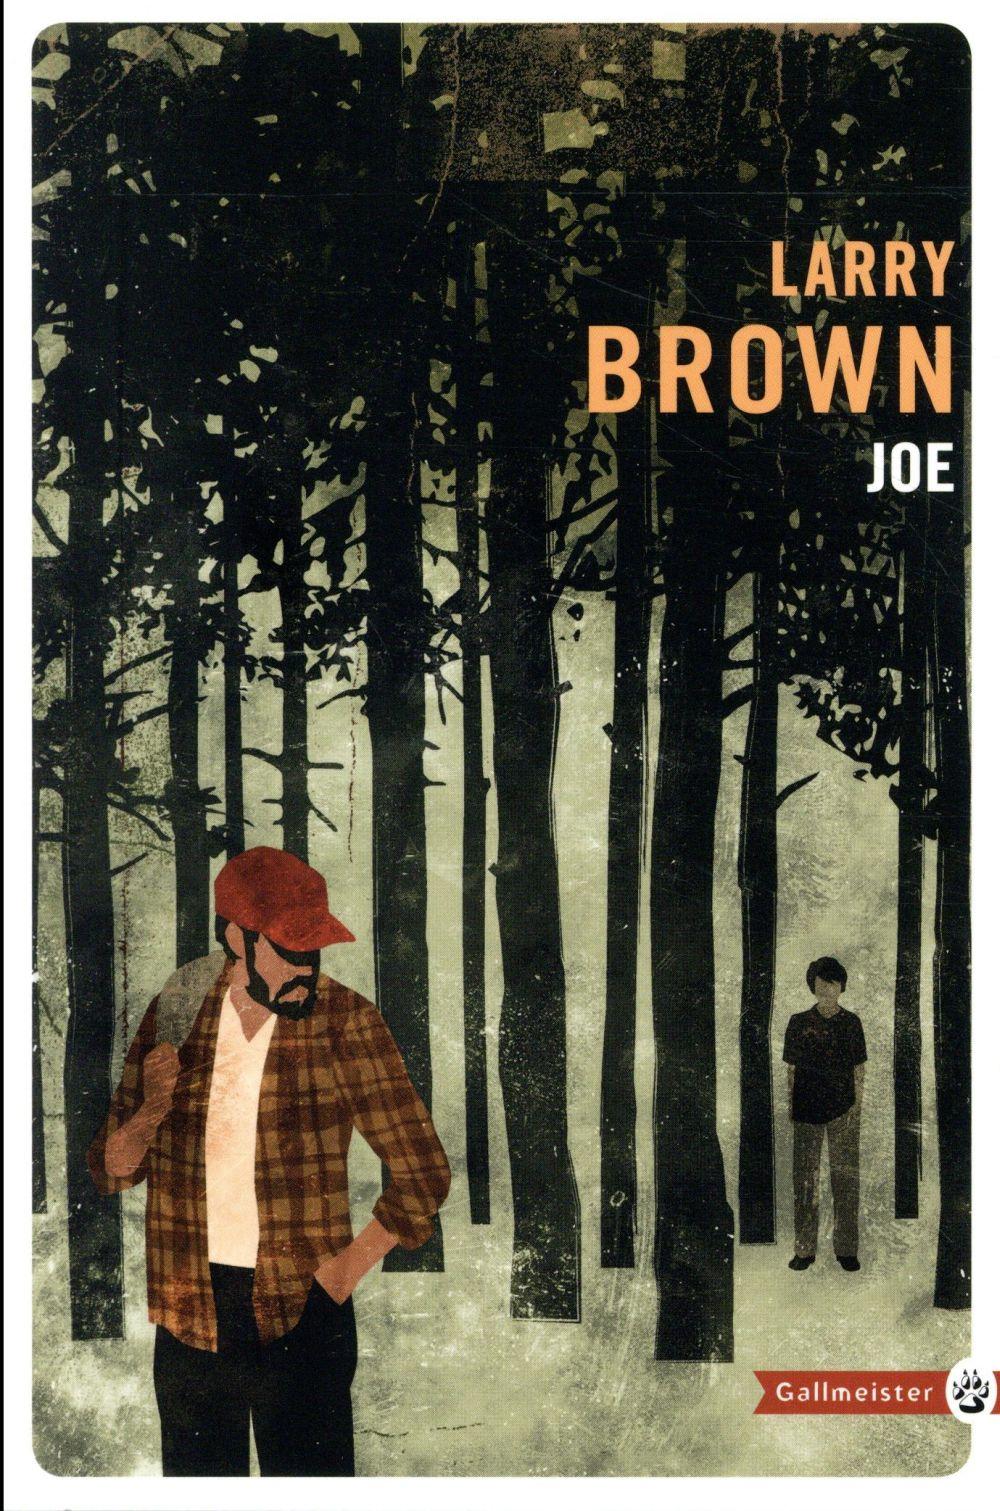 JOE BROWN LARRY GALLMEISTER